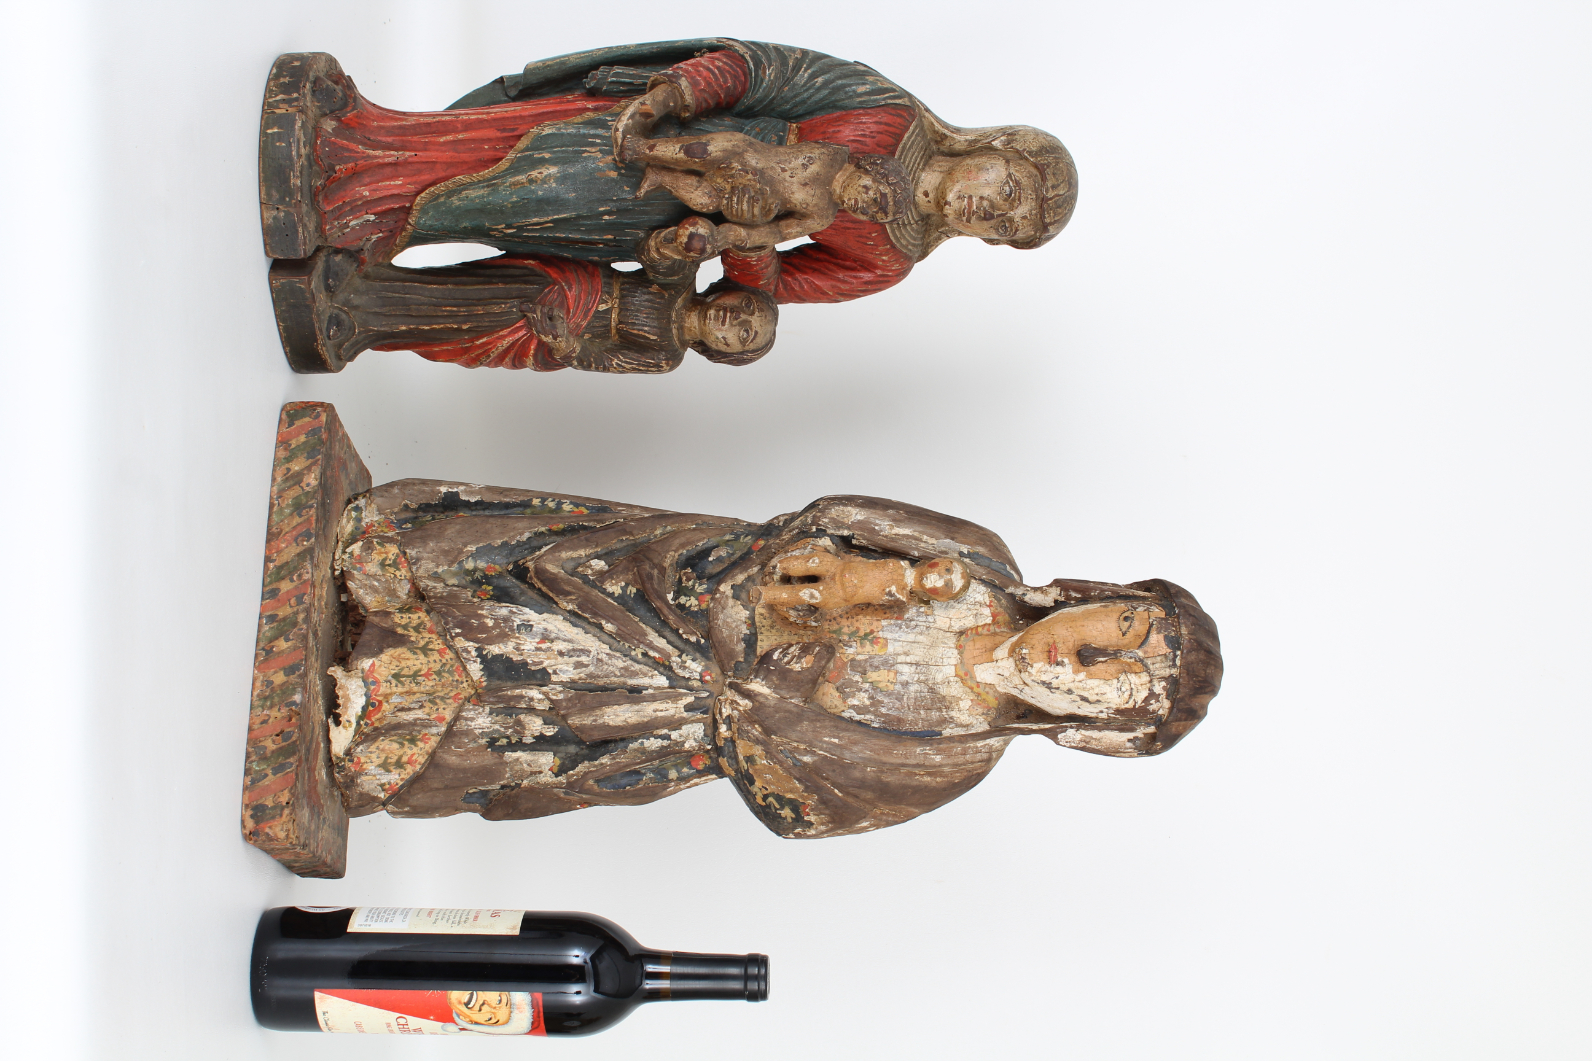 (2) Antique Carved Spanish Santos Figures - Image 2 of 4